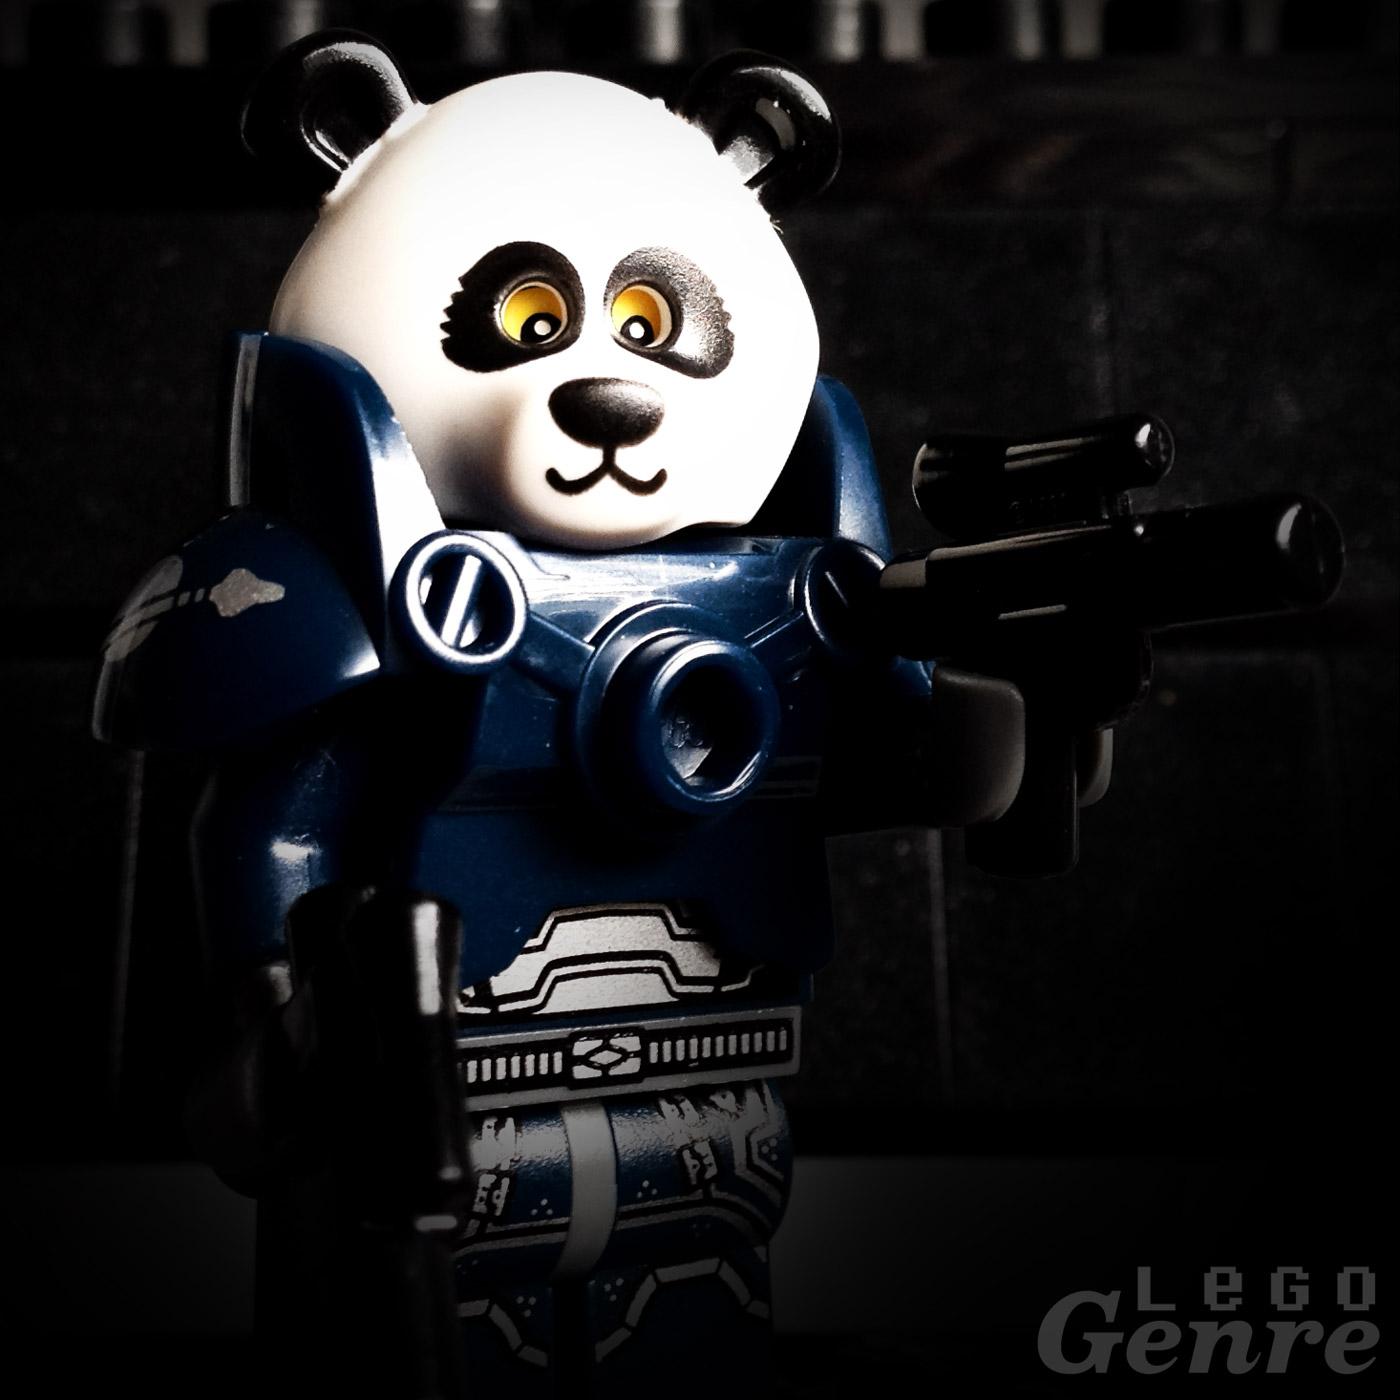 LegoGenre 00356: Panda Troopers